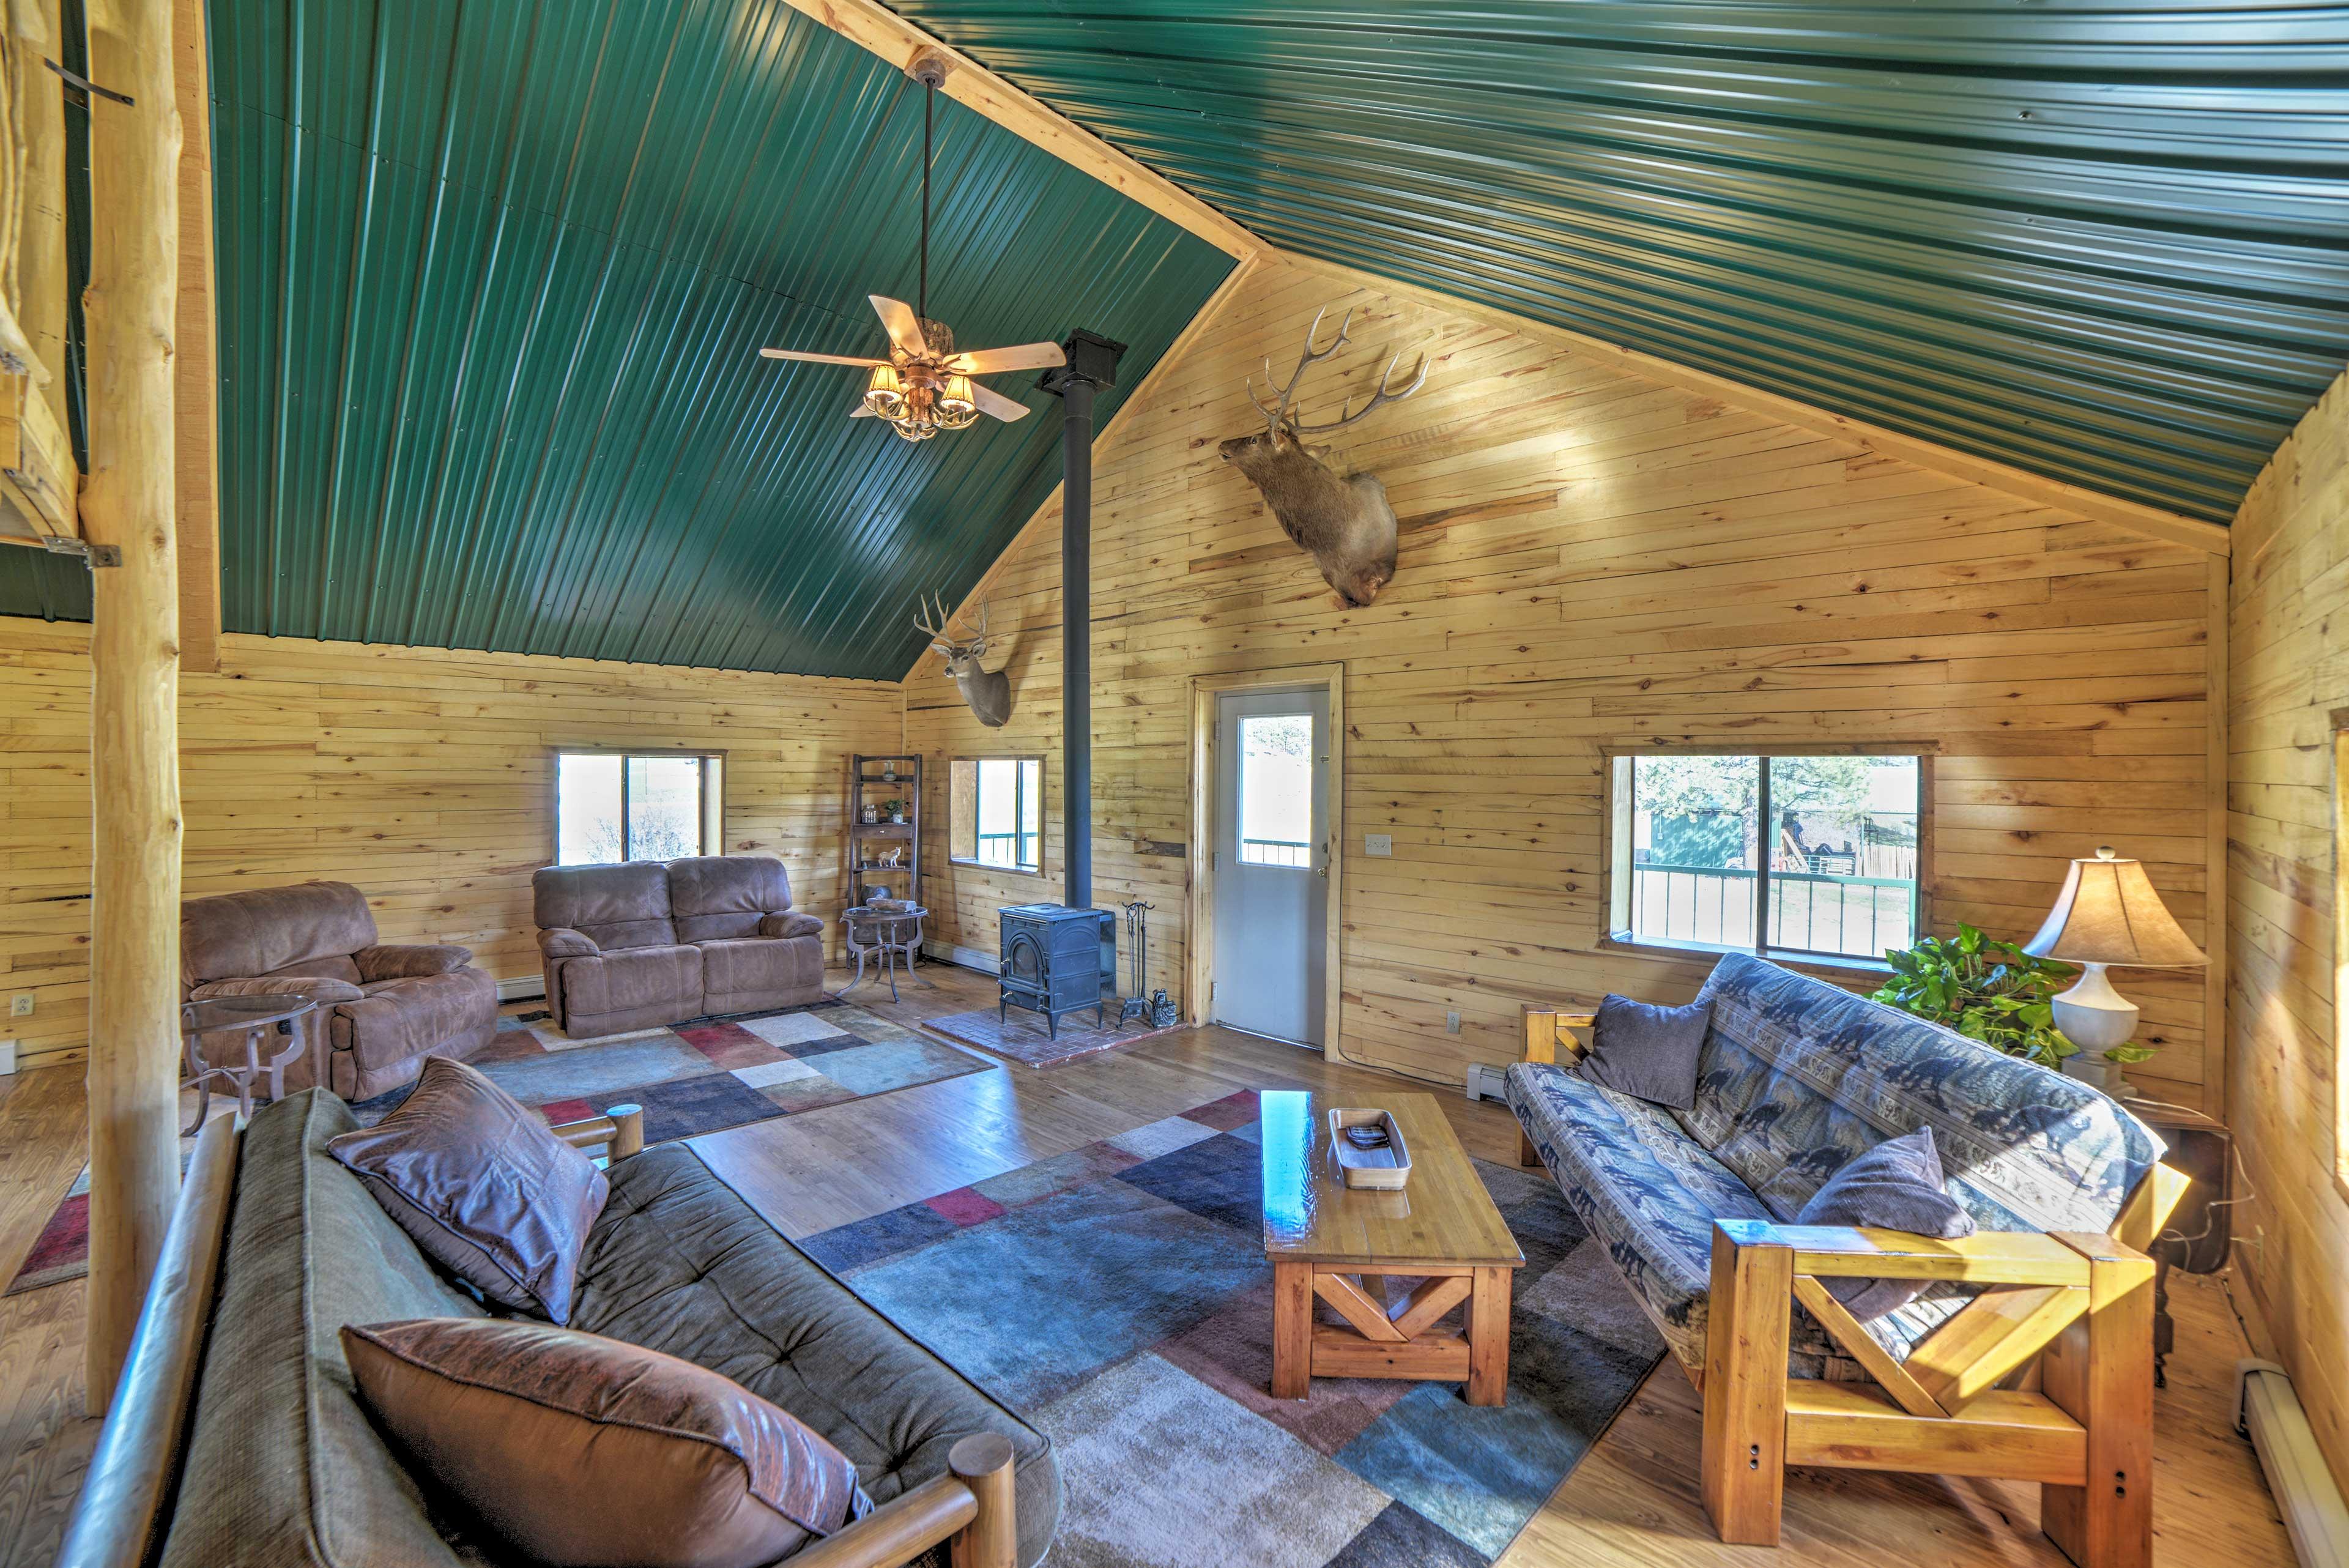 Living Room | Wood-Burning Stove | Rustic Furnishings | Ceiling Fan